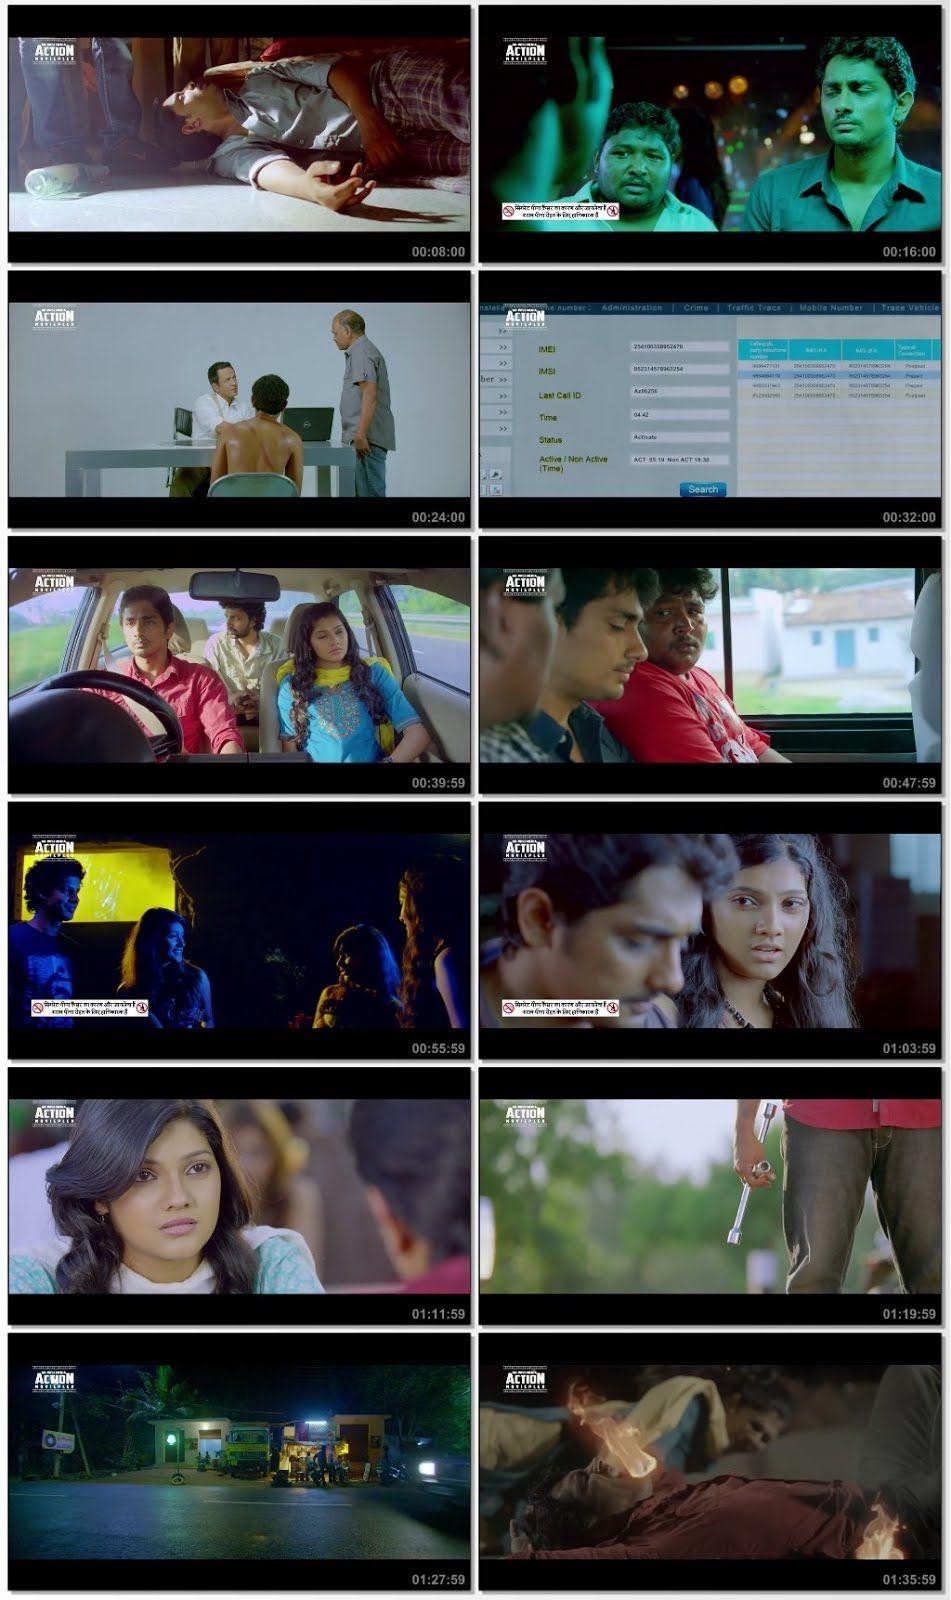 168 Min Uploaded By Eagle Home Entertainmentswatch Apaharan Super Hit Hindi Full Movie On Eagle Hindi Movies Featuring Ajay Devgan